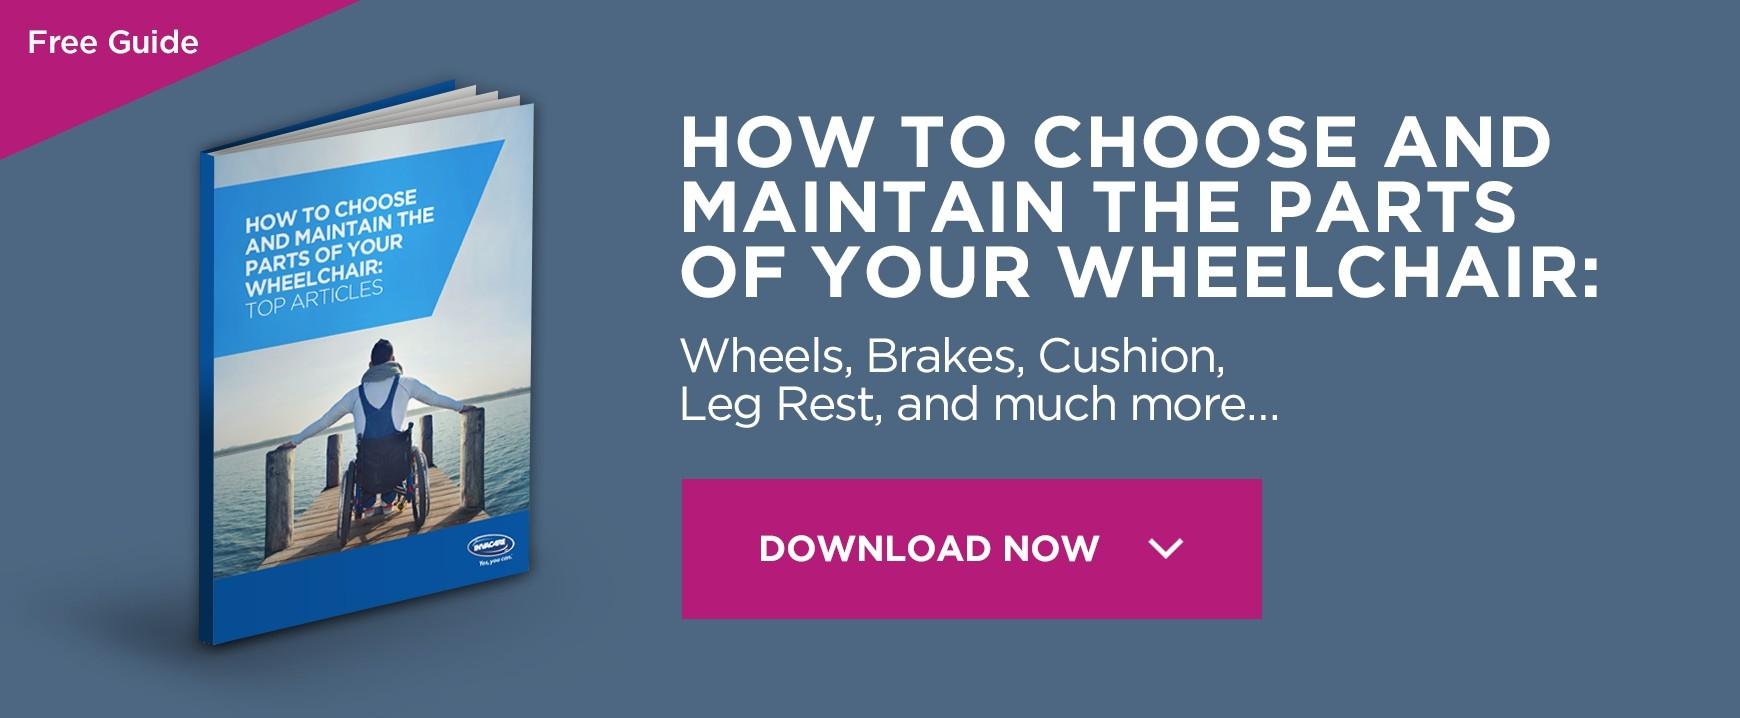 CTA - Post - Wheelchair Parts